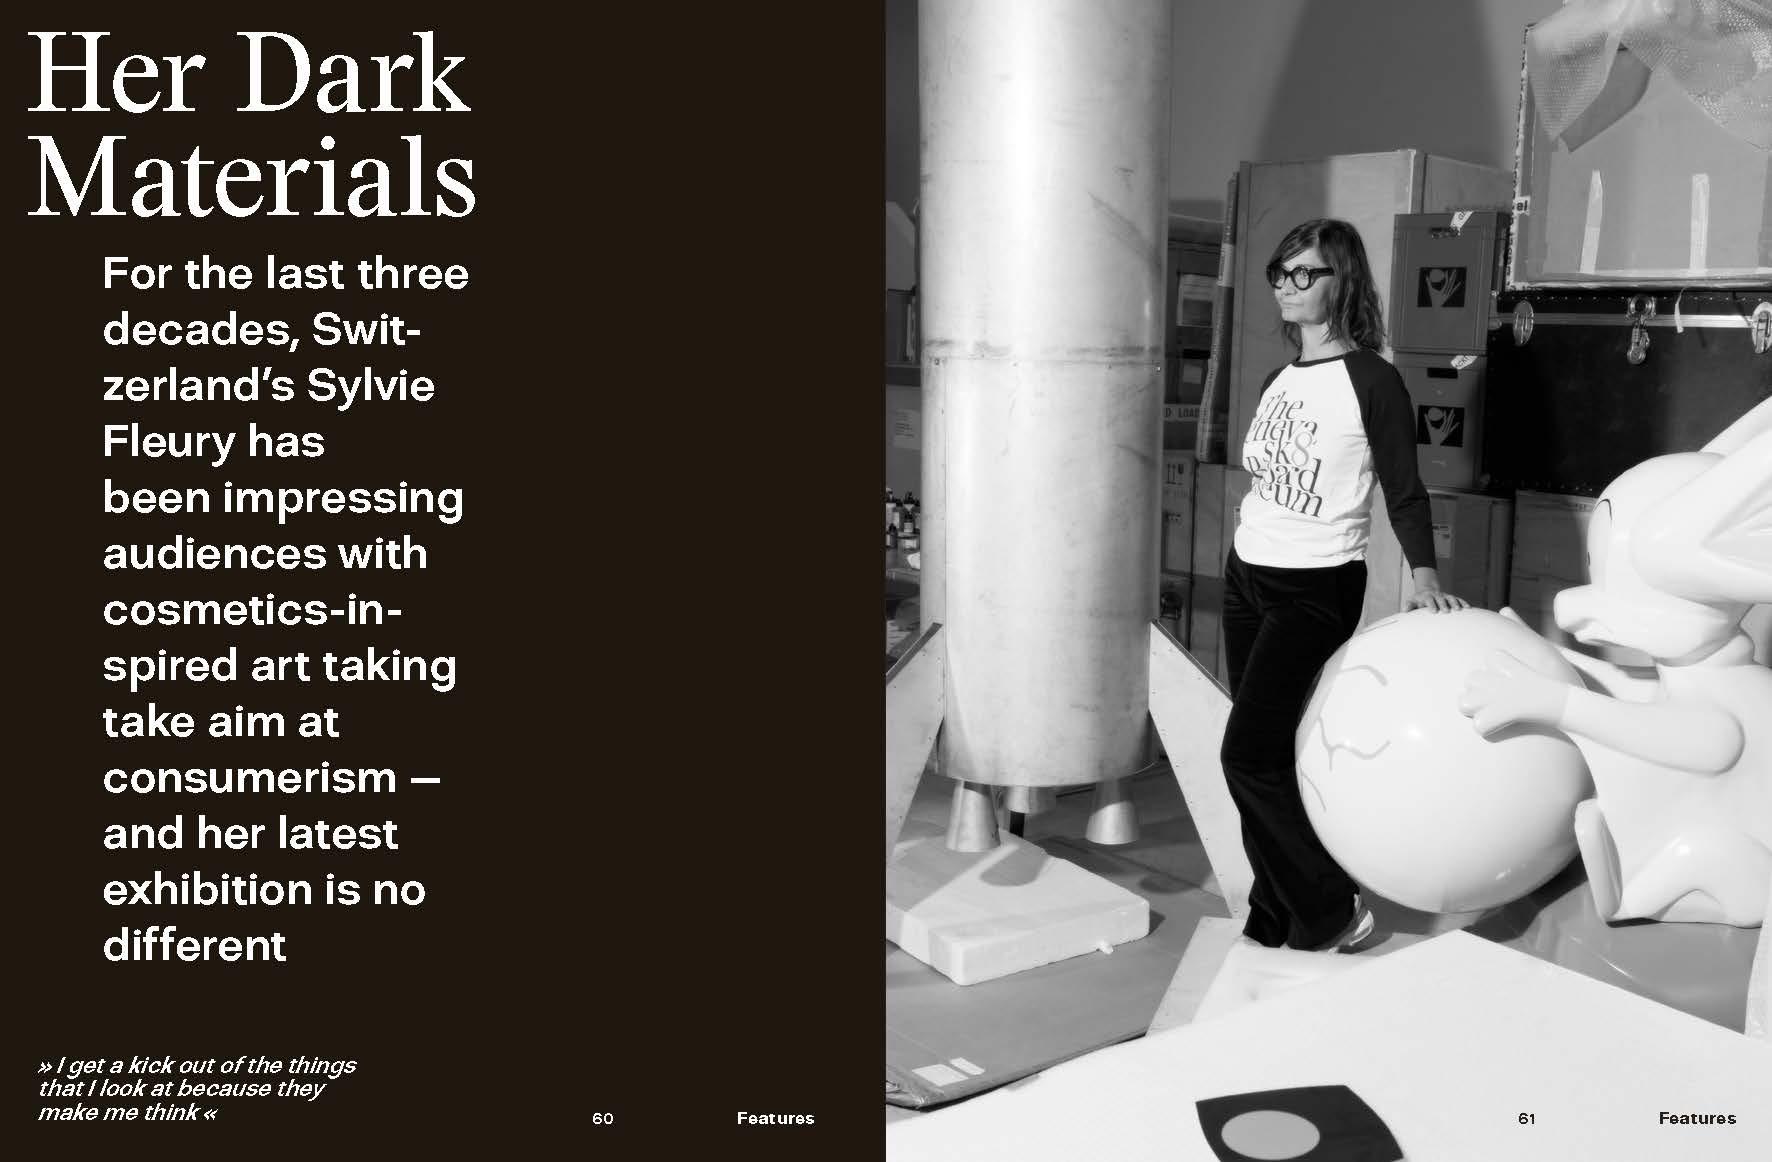 56_Features Her Dark Materials 1.jpg